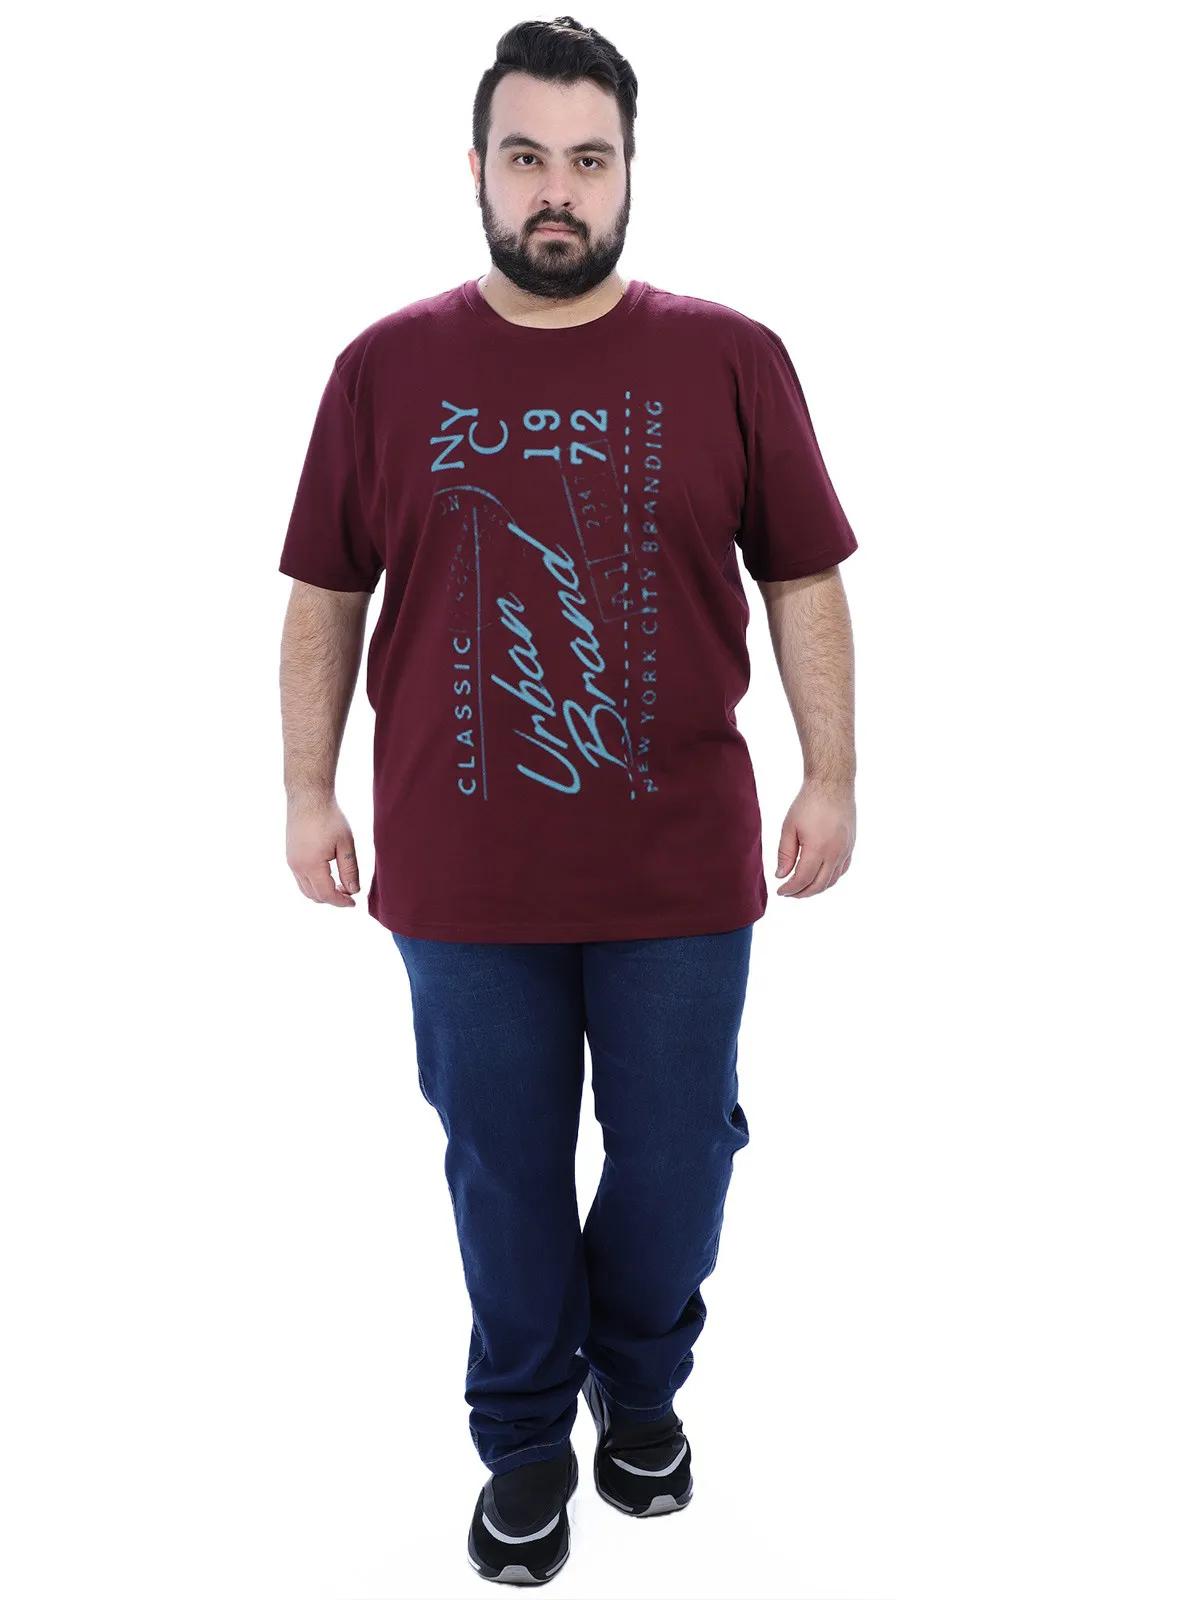 Camiseta Plus Size Masculino Gola Careca Estampada Vinho